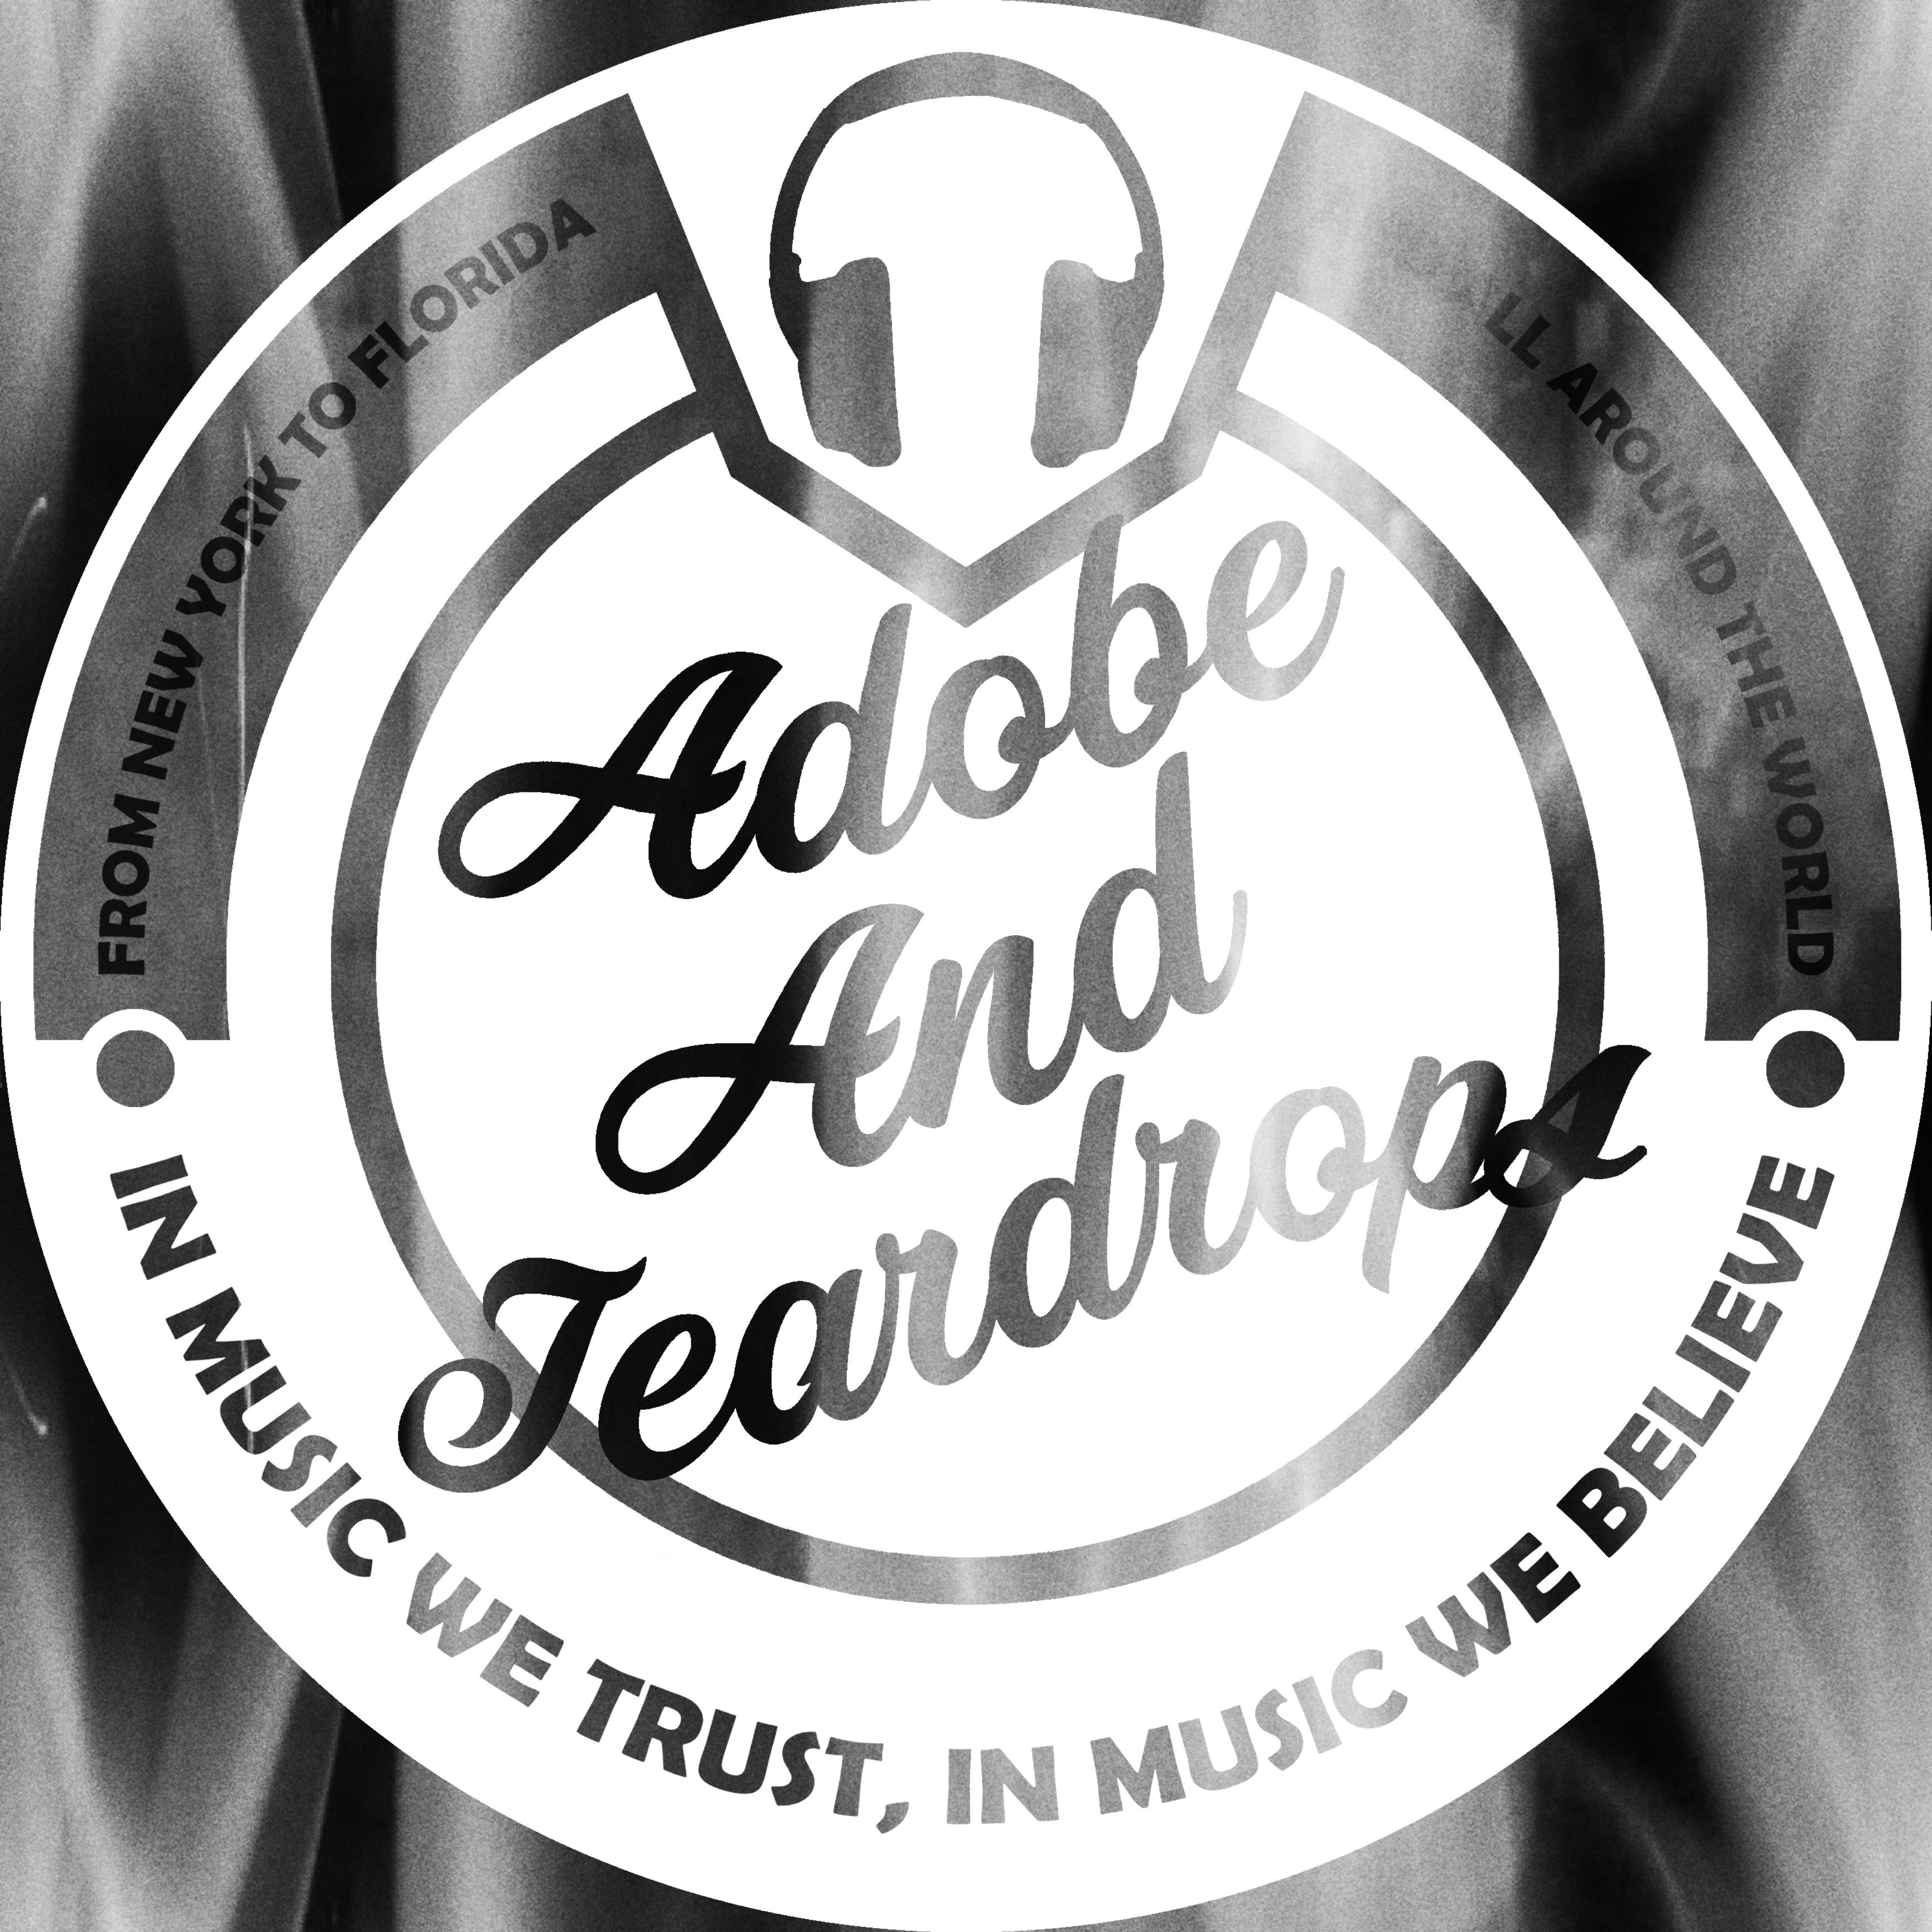 Adobe And Teardrops Podcast   Podbay